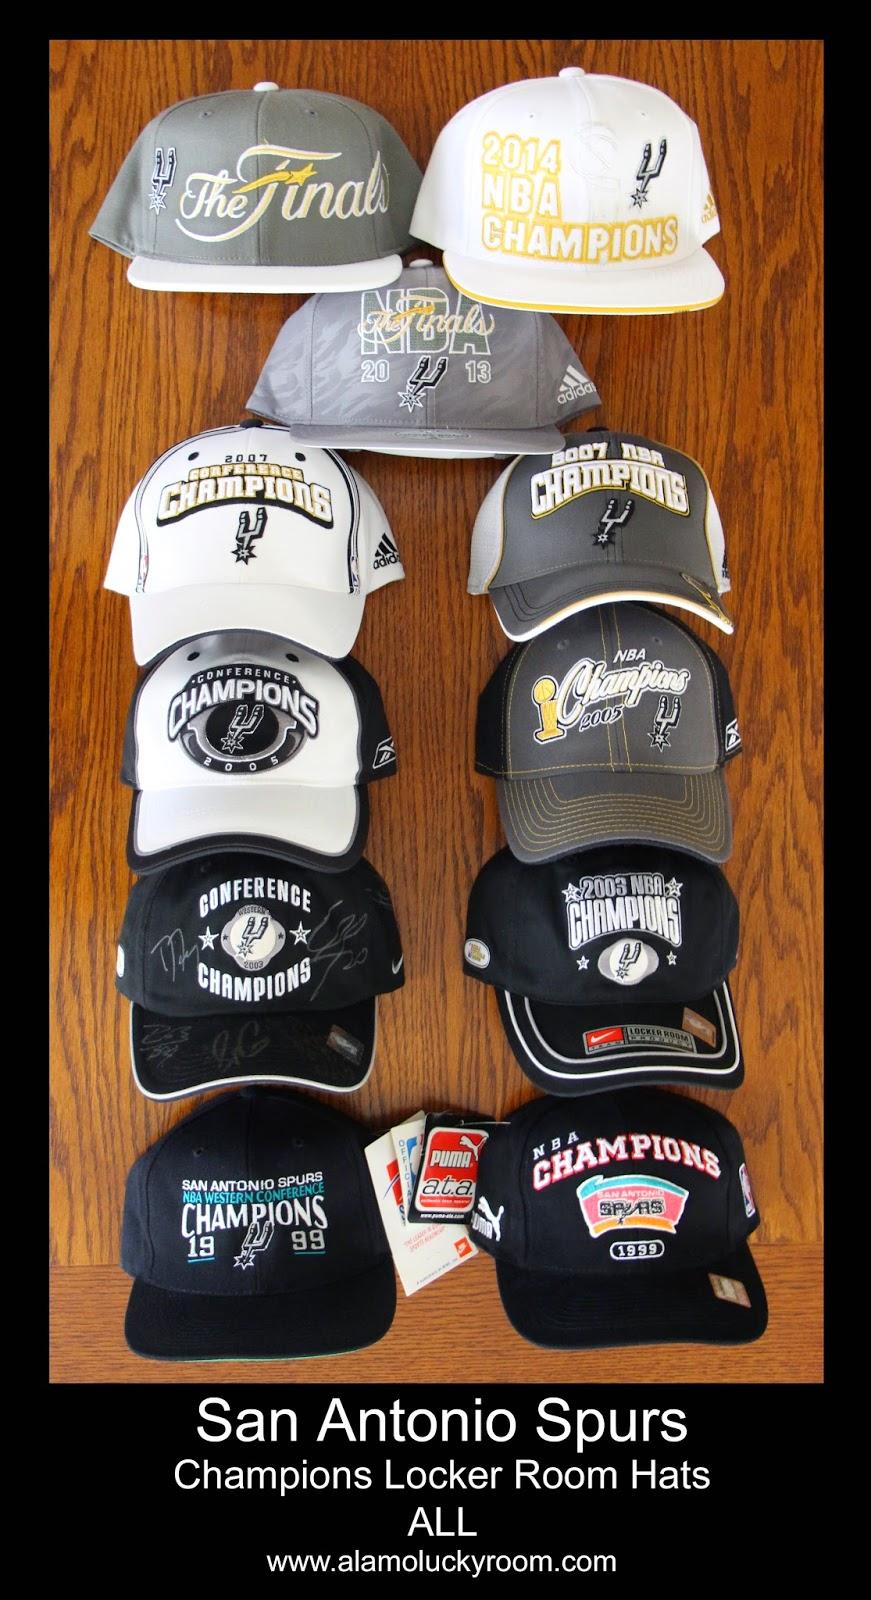 04f9248bff0 San Antonio Spurs NBA Champions Locker Room Hats ALL